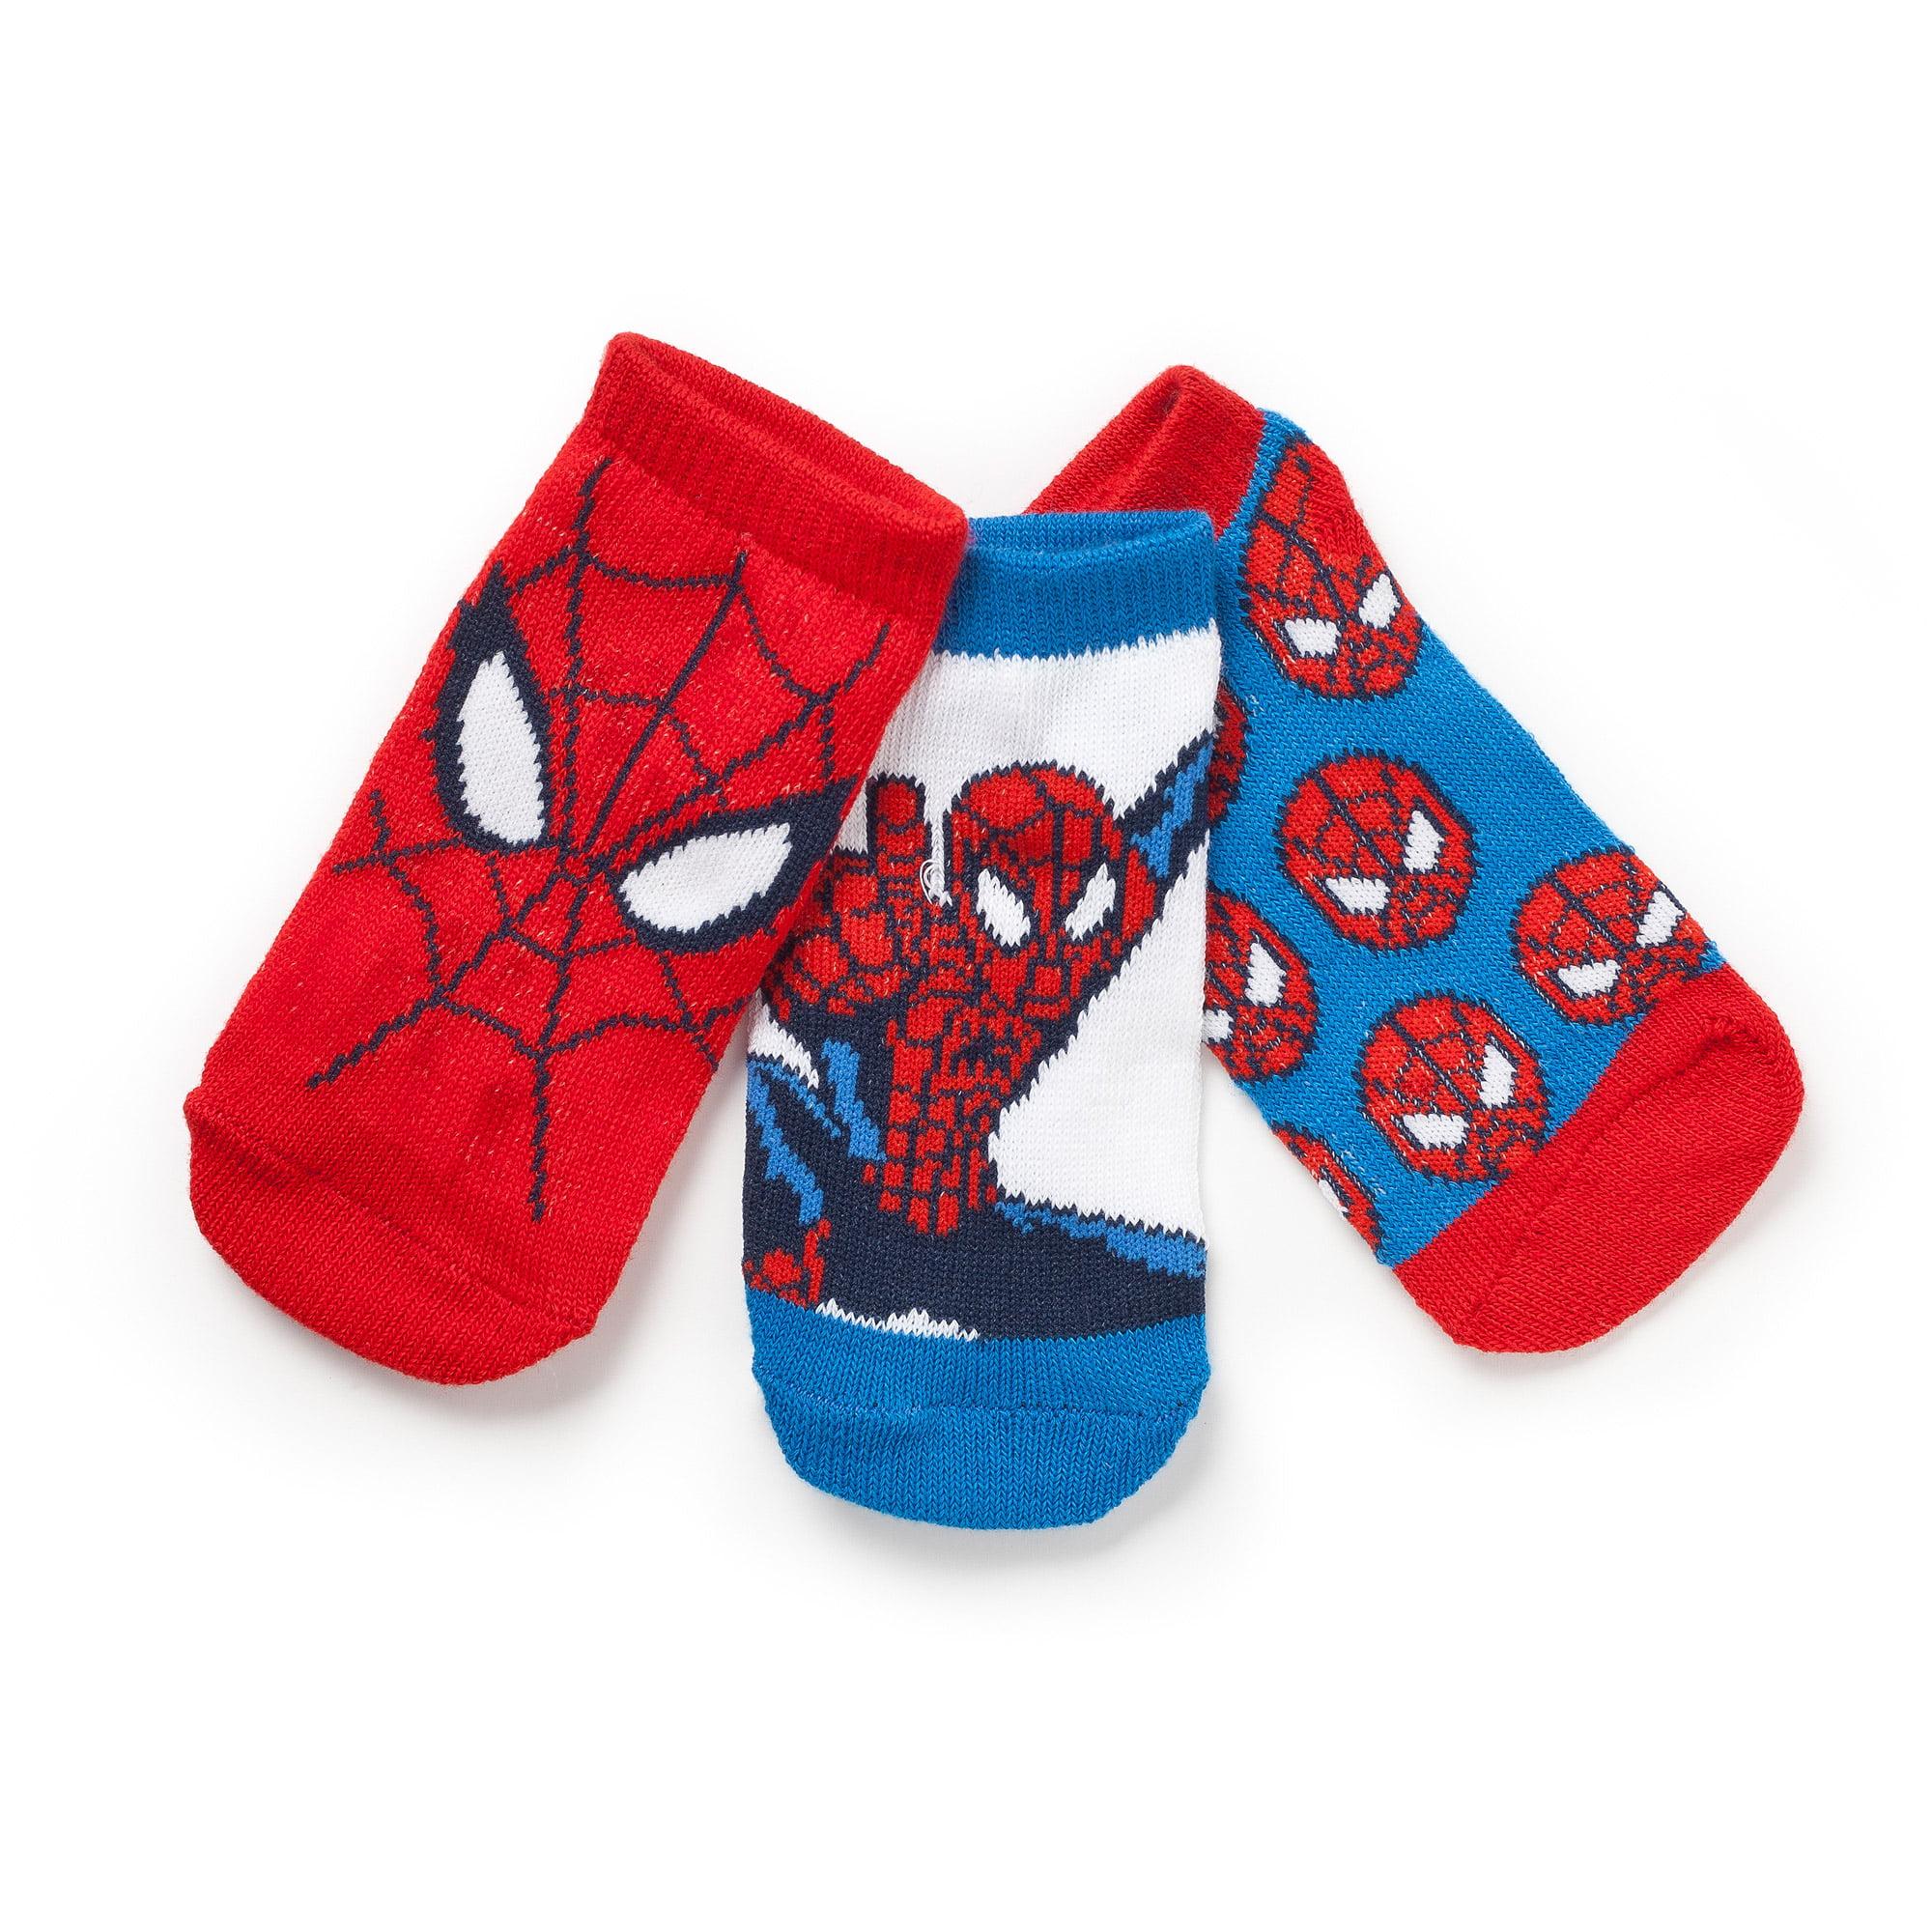 Baby Toddler Boy Crew Socks 3 Pack Walmart